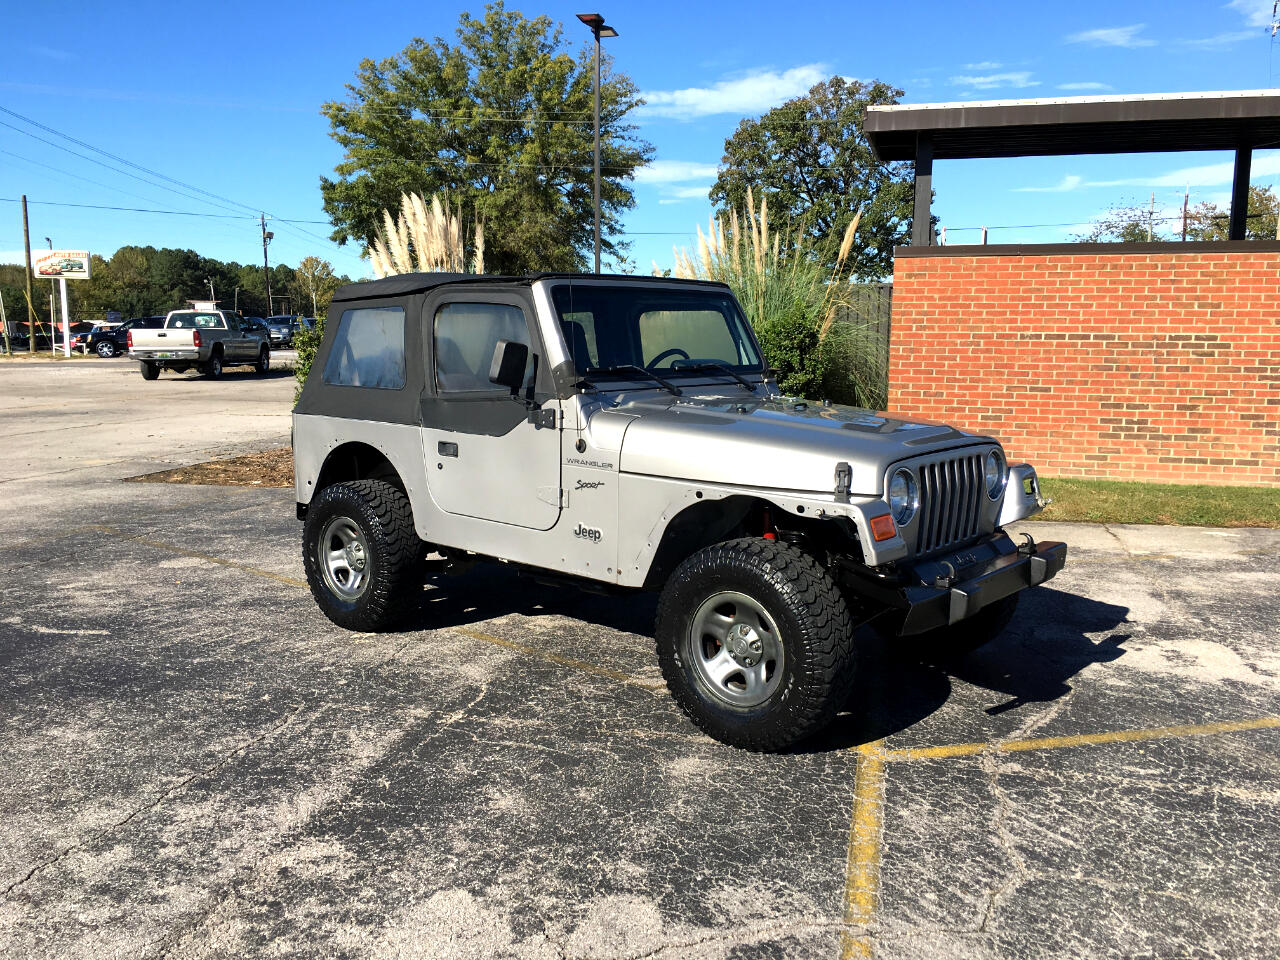 used 2002 jeep wrangler 2dr sport for sale in jasper al 35501 jasper auto sales select. Black Bedroom Furniture Sets. Home Design Ideas